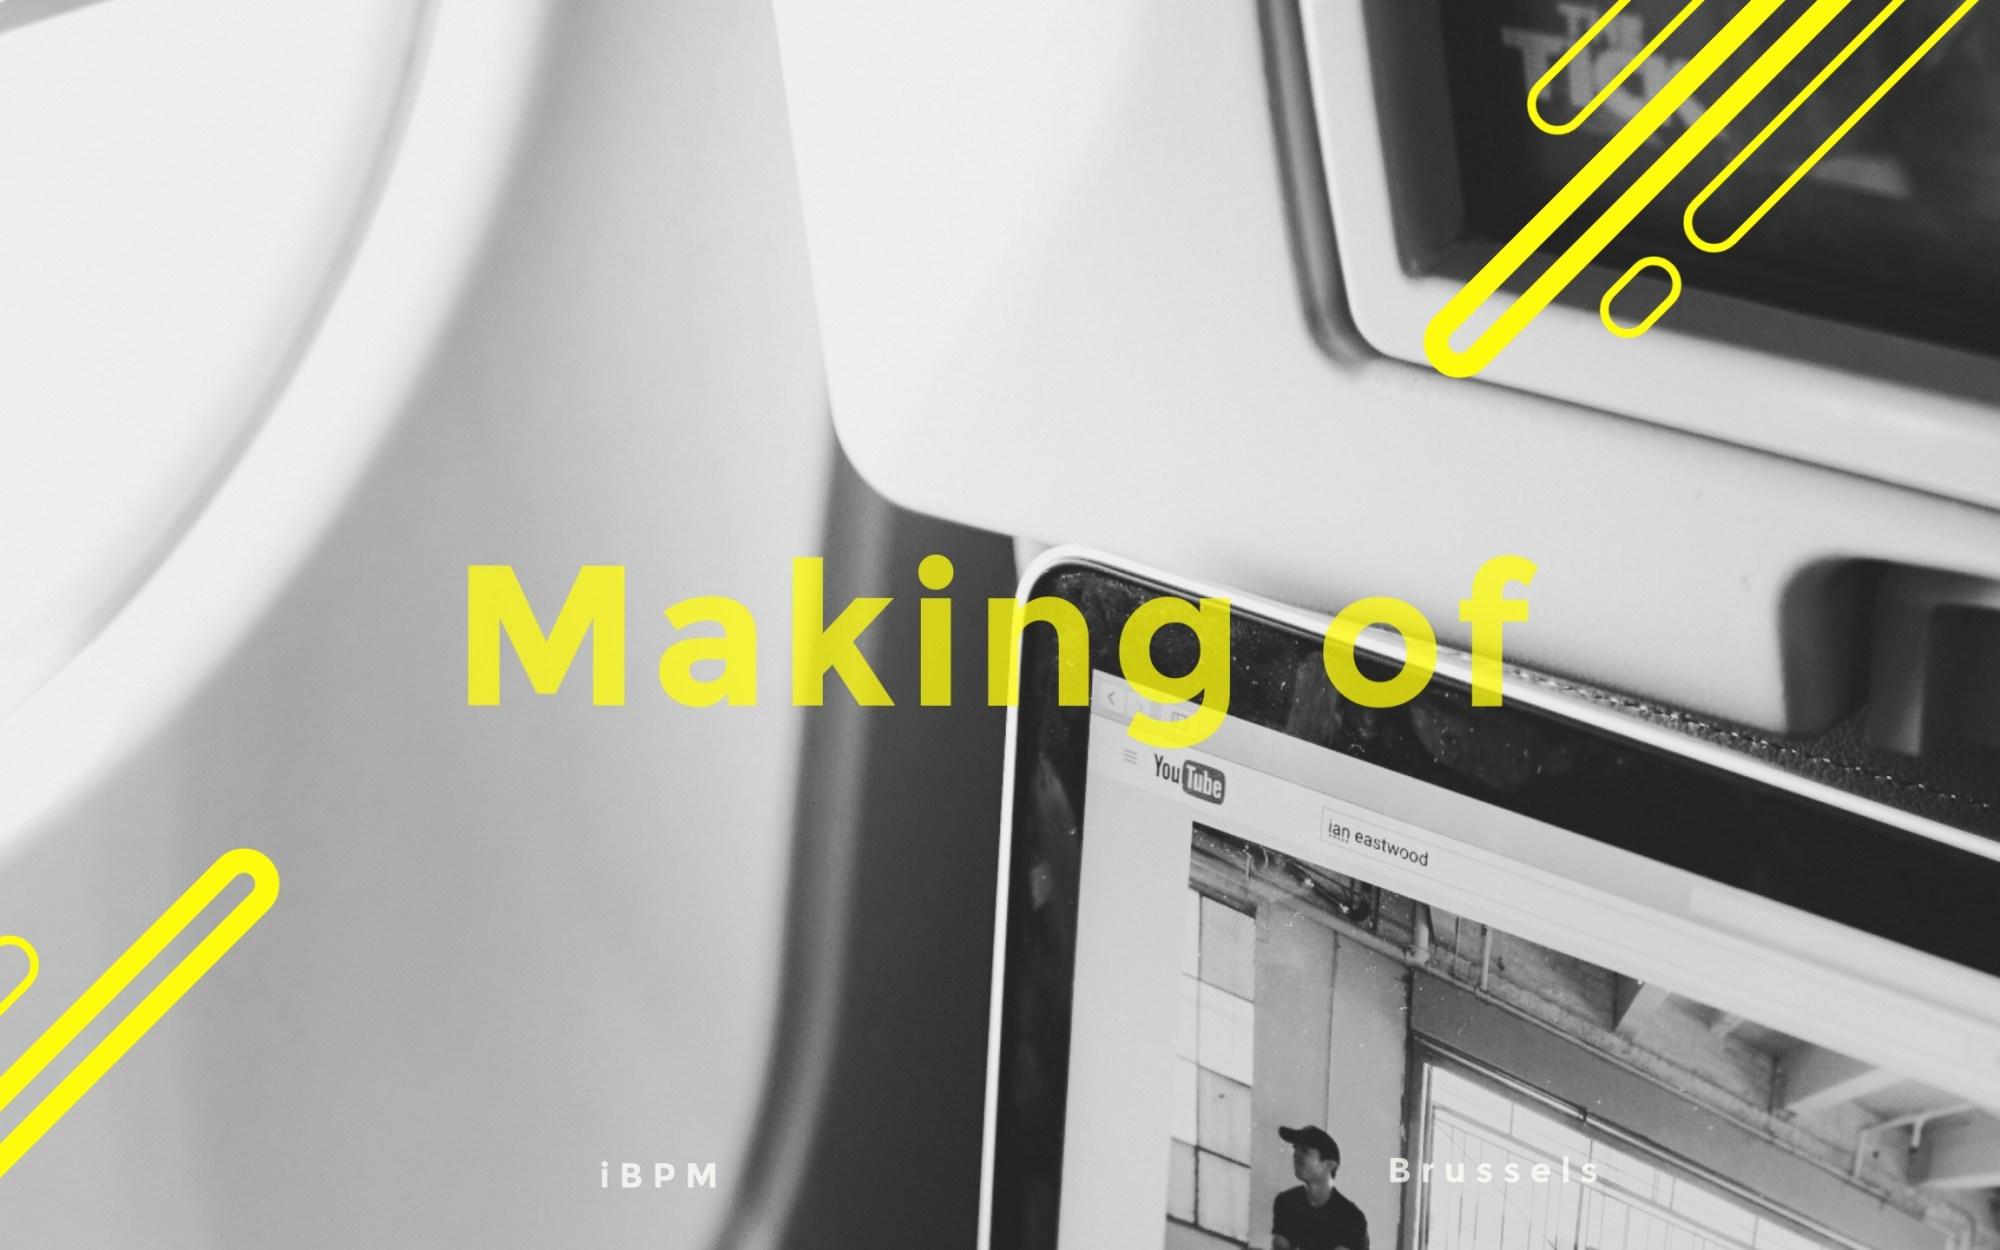 Making OF - iBPM Production